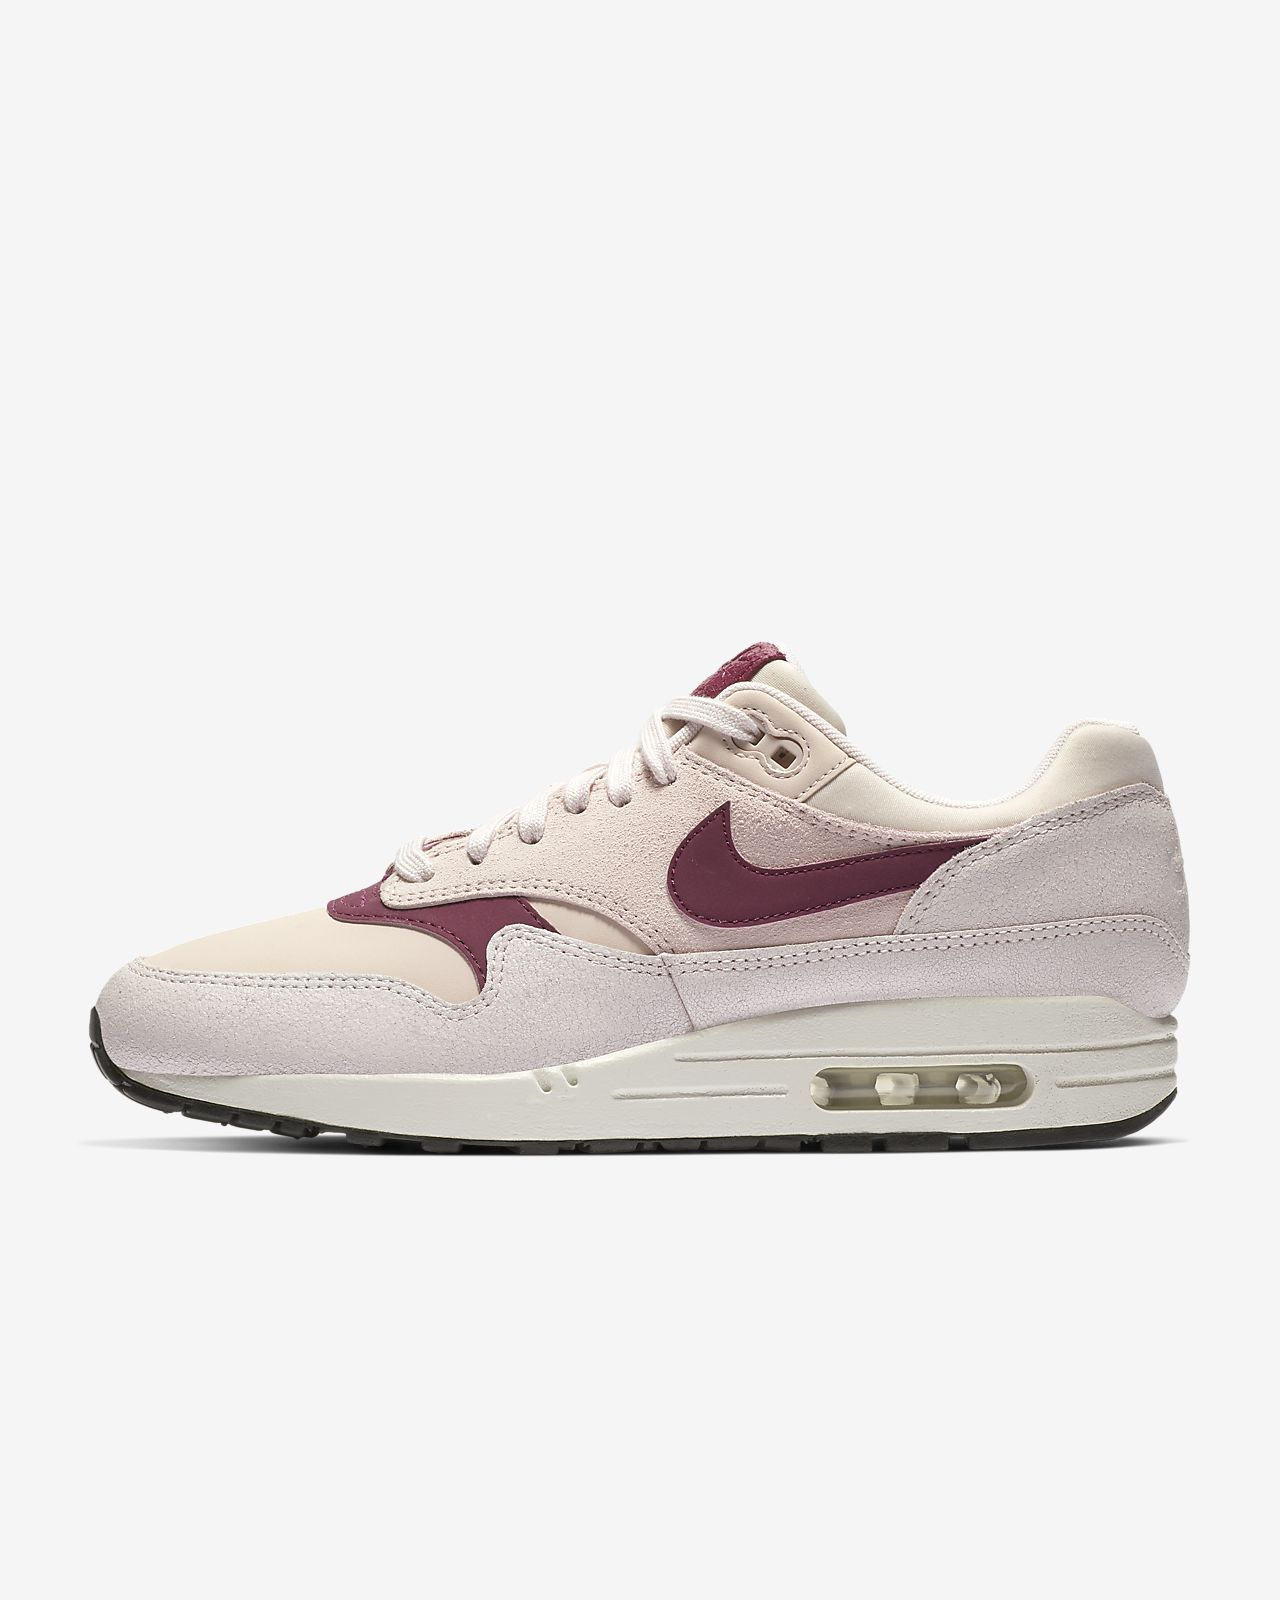 separation shoes 3b142 3930d ... Nike Air Max 1 Premium - sko til kvinder